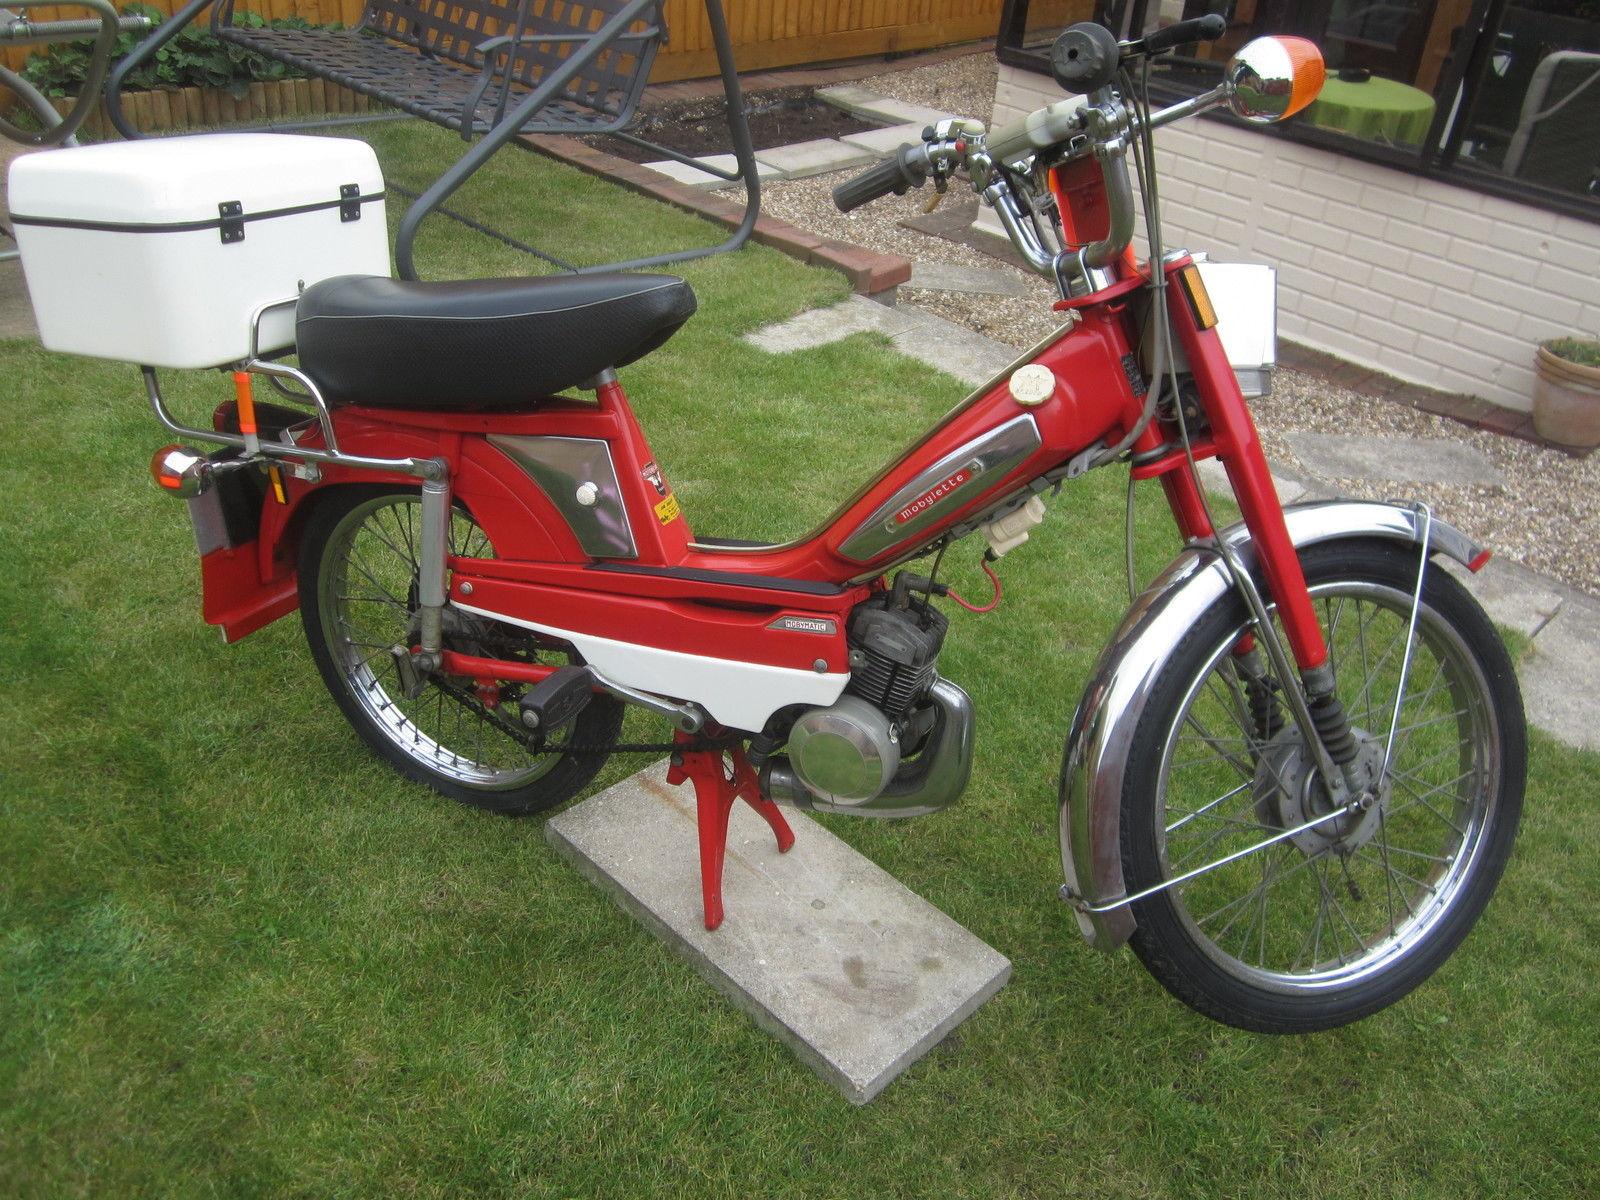 mobylette mobymatic motobecane moped 1974 bereavement sale. Black Bedroom Furniture Sets. Home Design Ideas